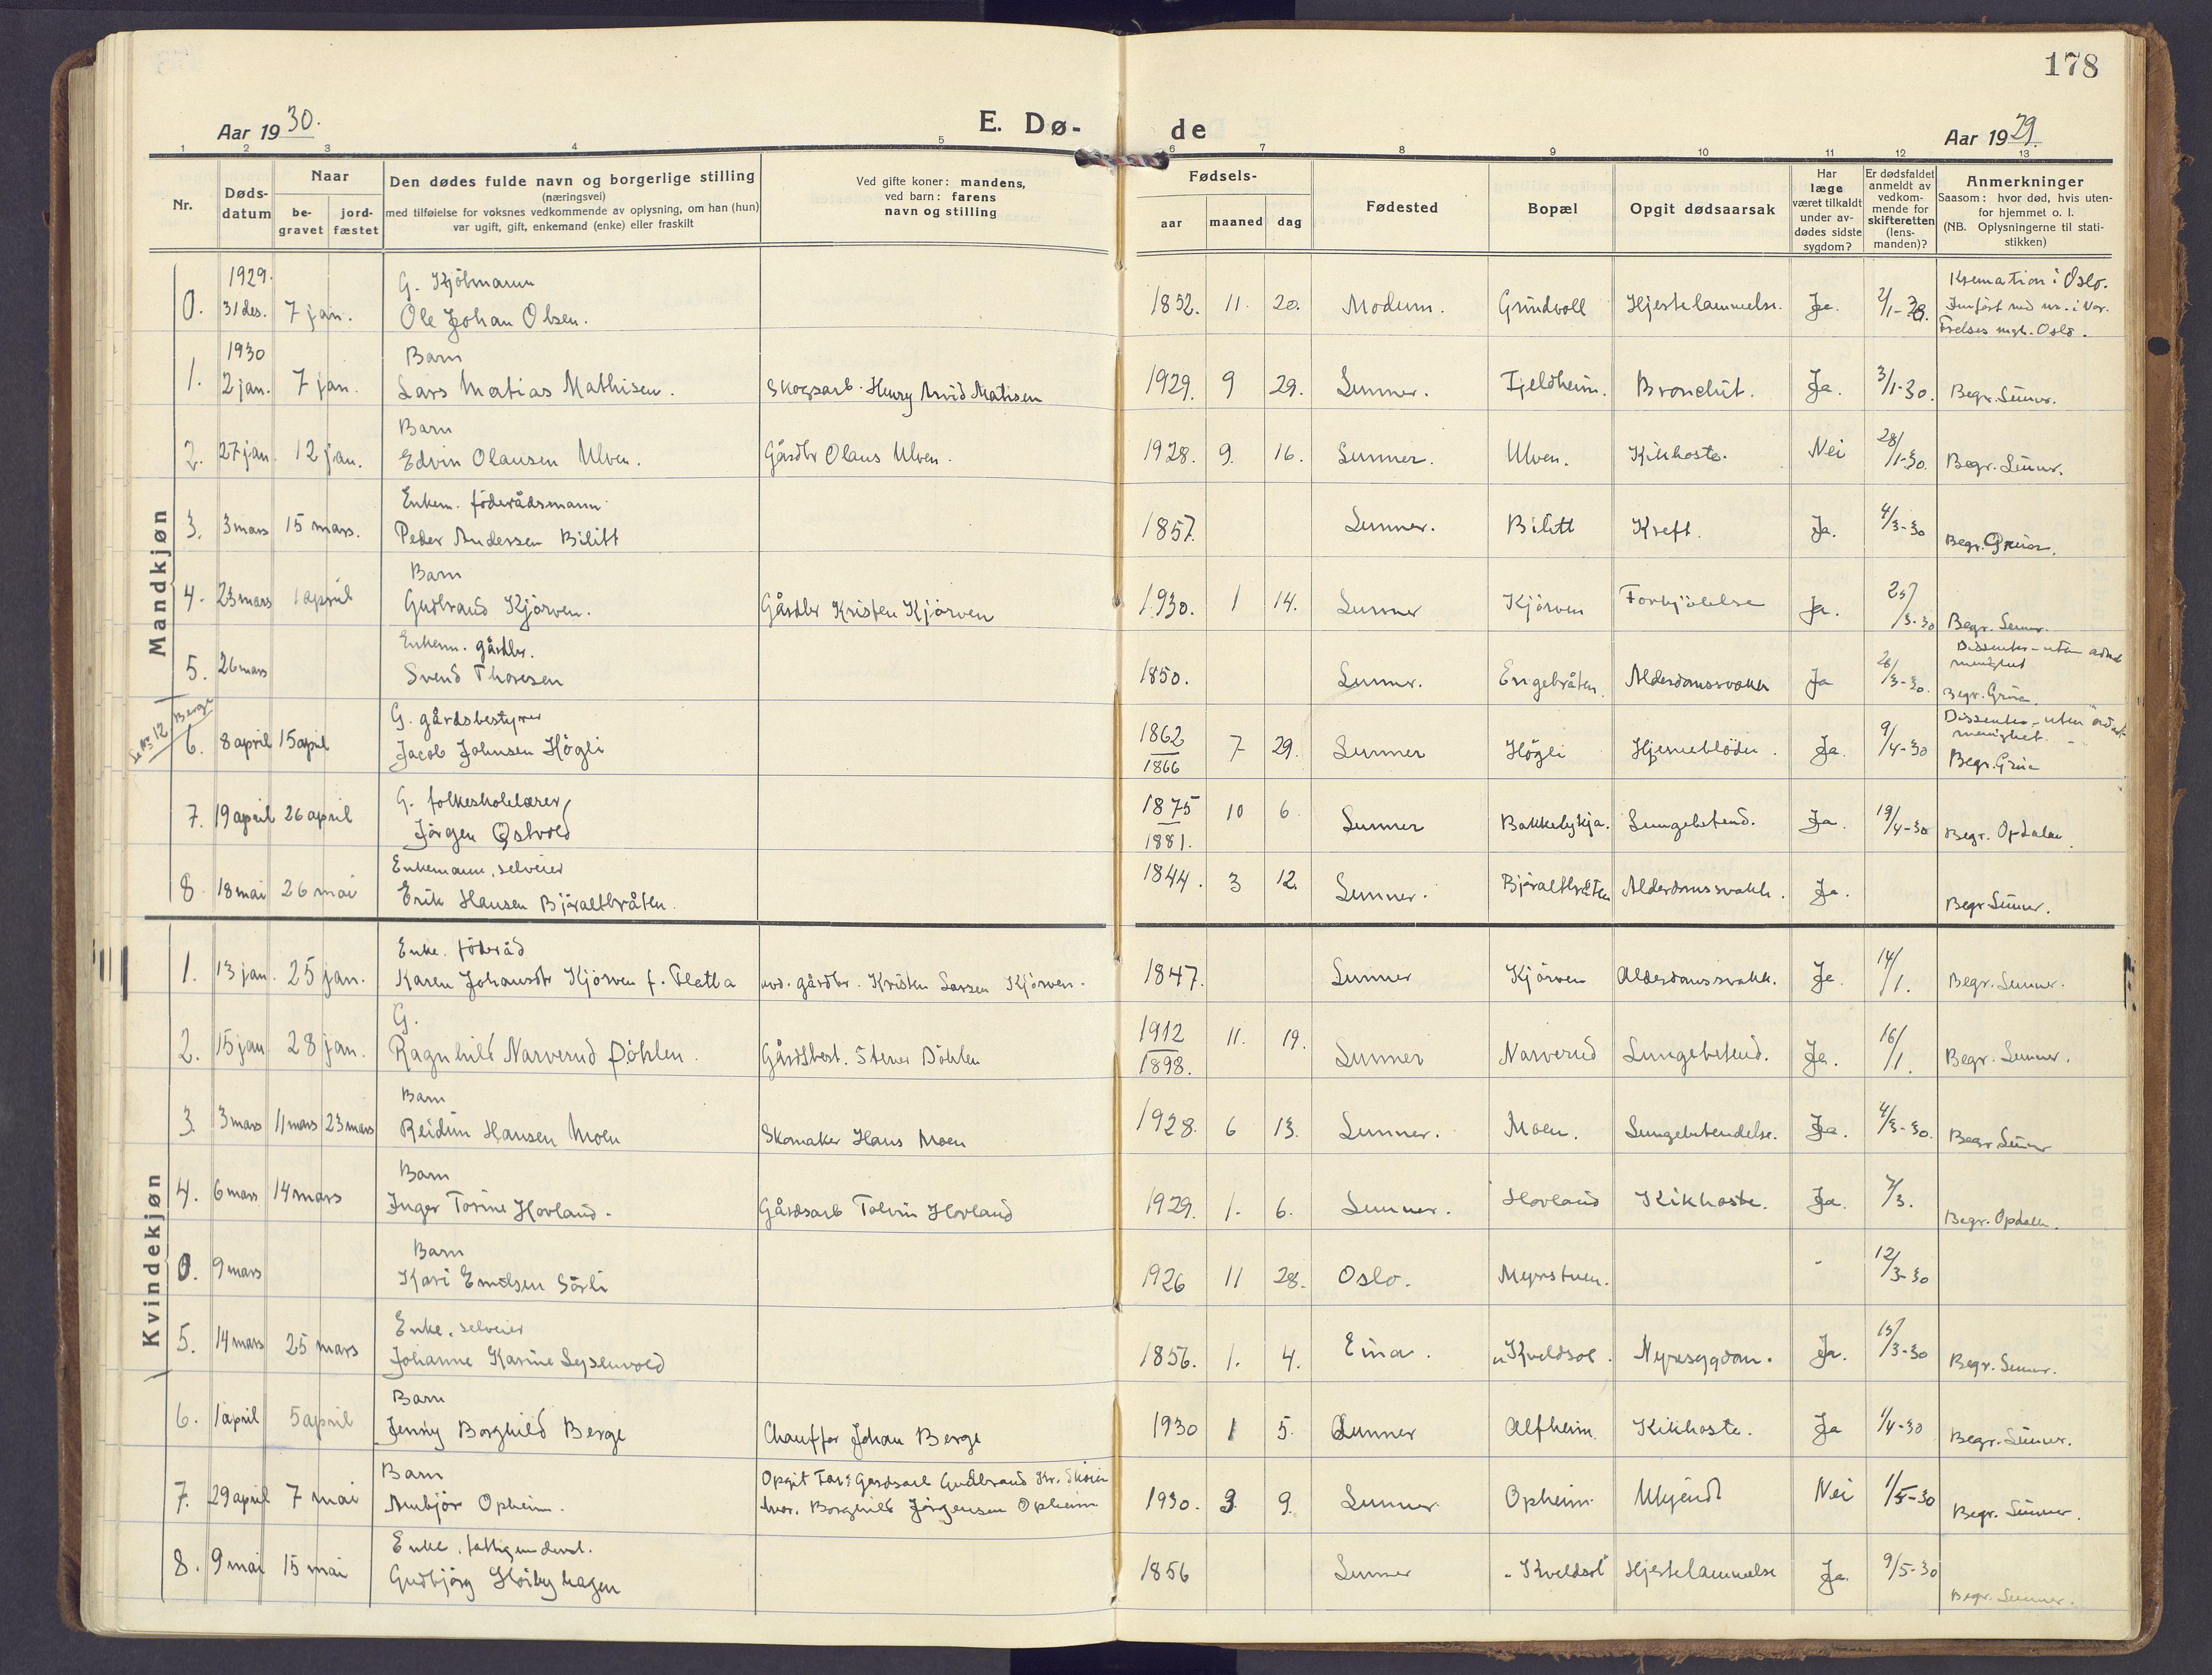 SAH, Lunner prestekontor, H/Ha/Haa/L0002: Ministerialbok nr. 2, 1922-1931, s. 178